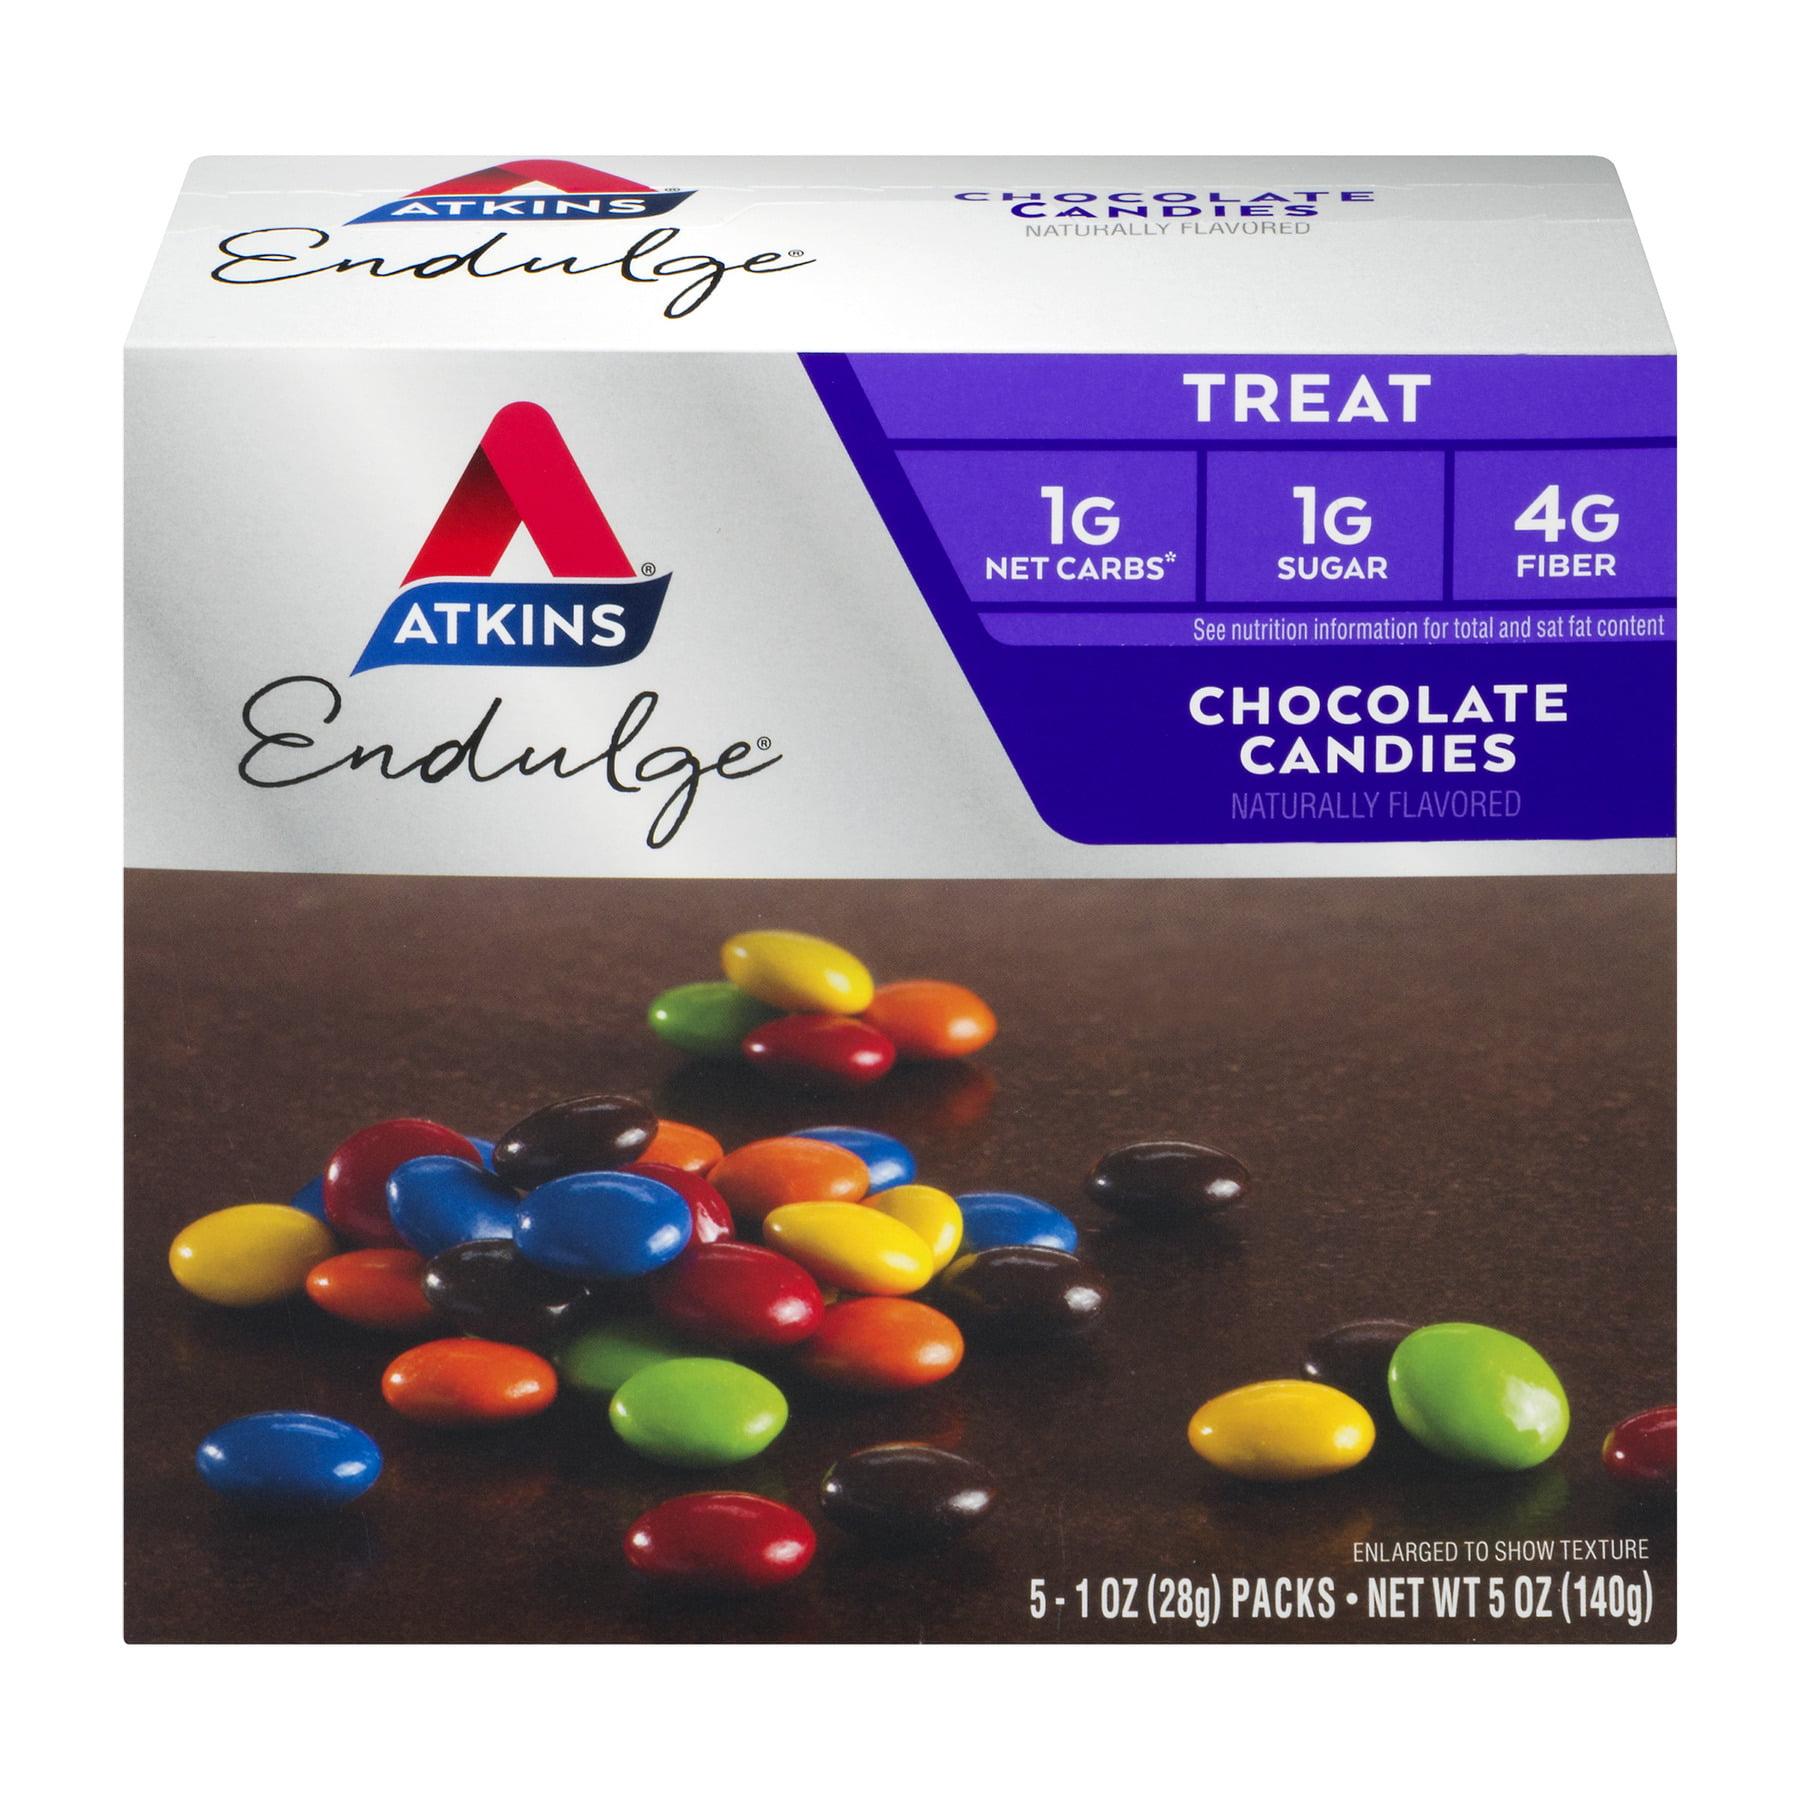 Atkins Endulge Chocolate Candies, 1oz pack, 5-pack (Treat)